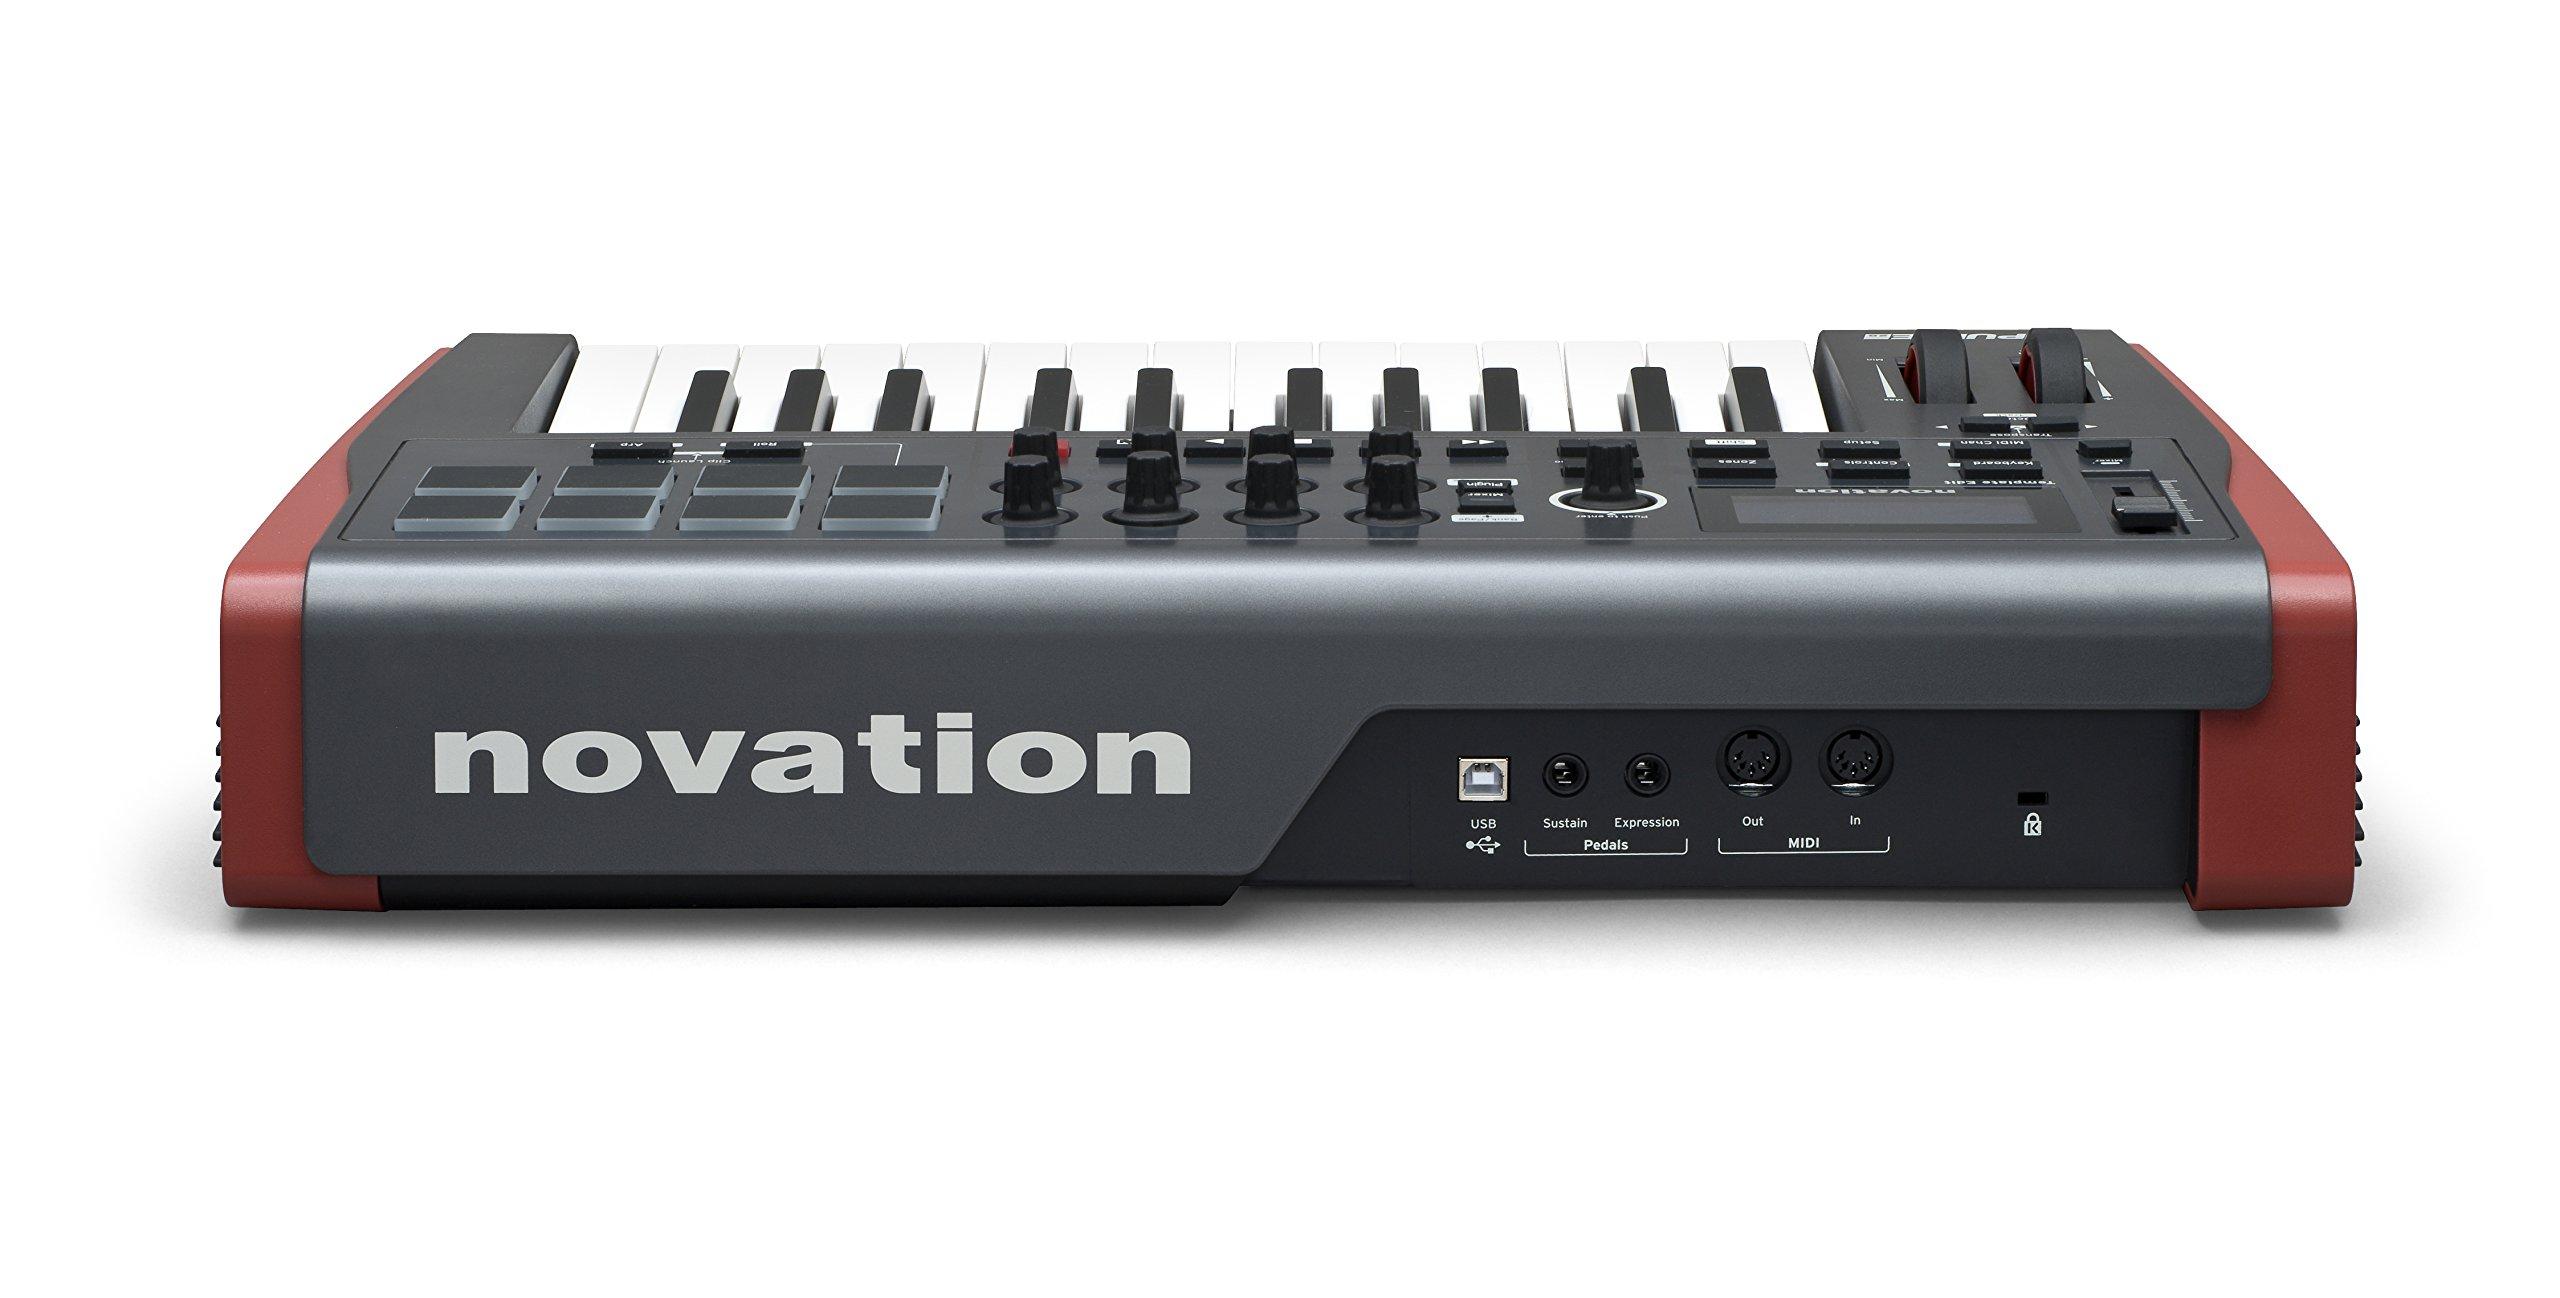 Novation Impulse 25 USB Midi Controller Keyboard, 25 Keys by Novation (Image #2)